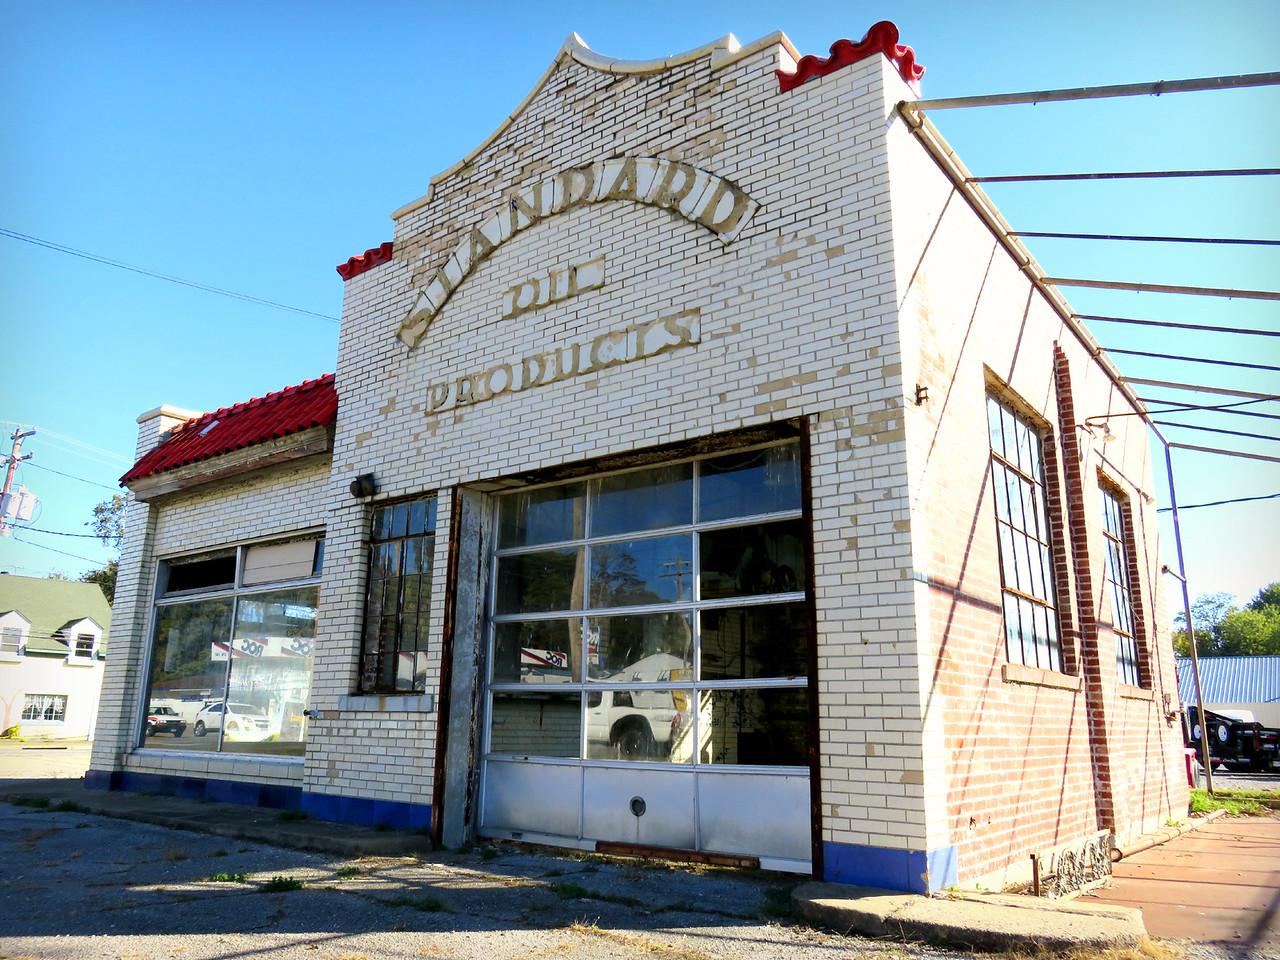 Vienna Illinois decaying Standard Oil Station - facade